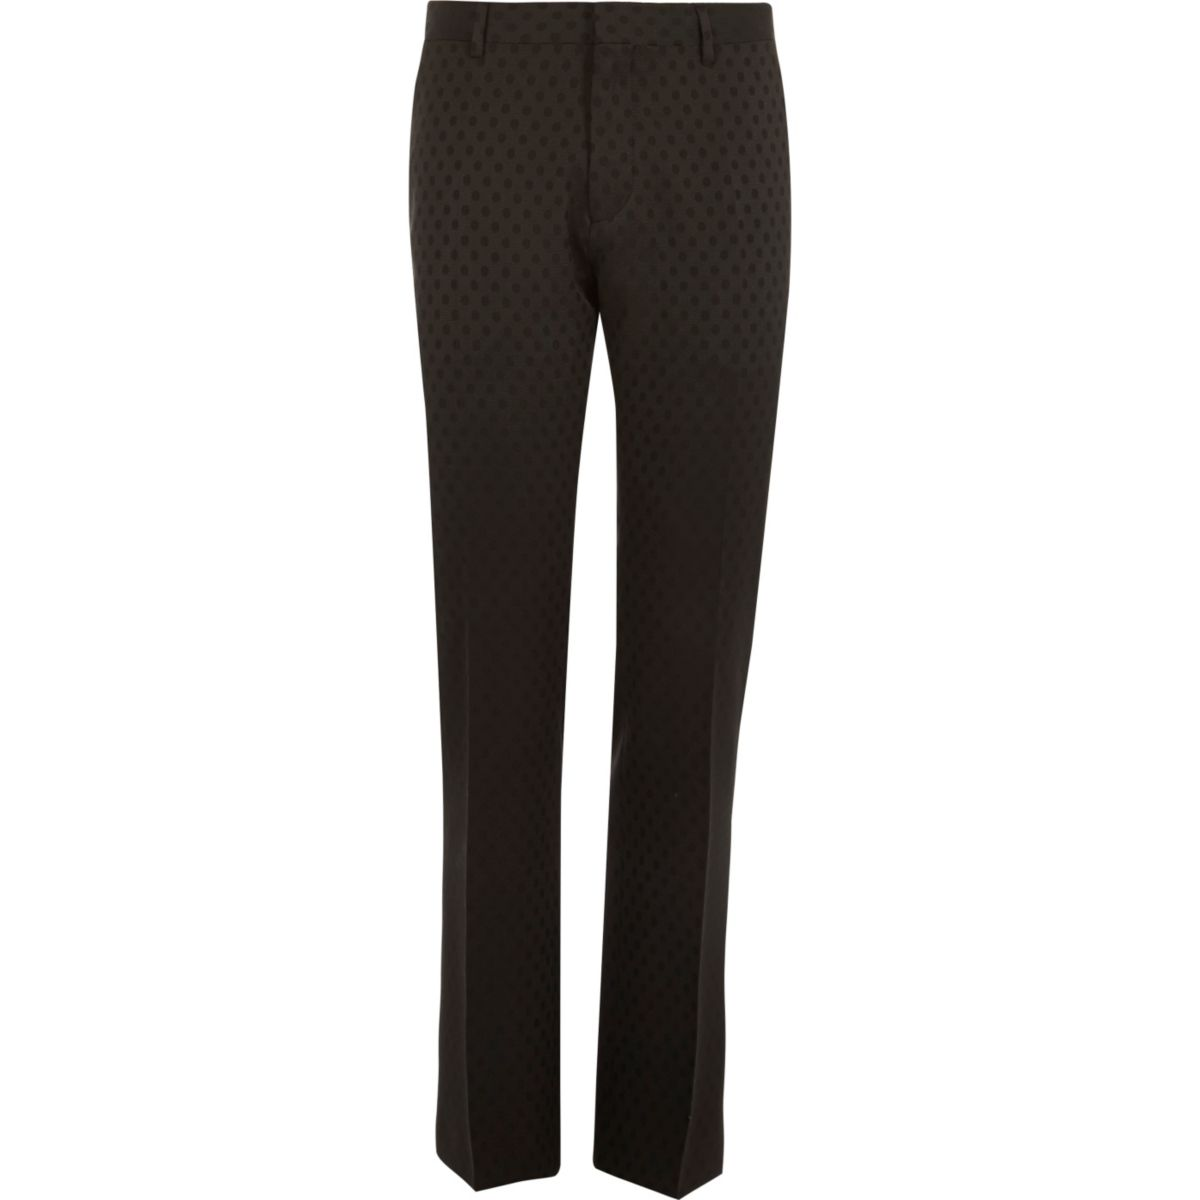 Black polka dot slim tux suit pants